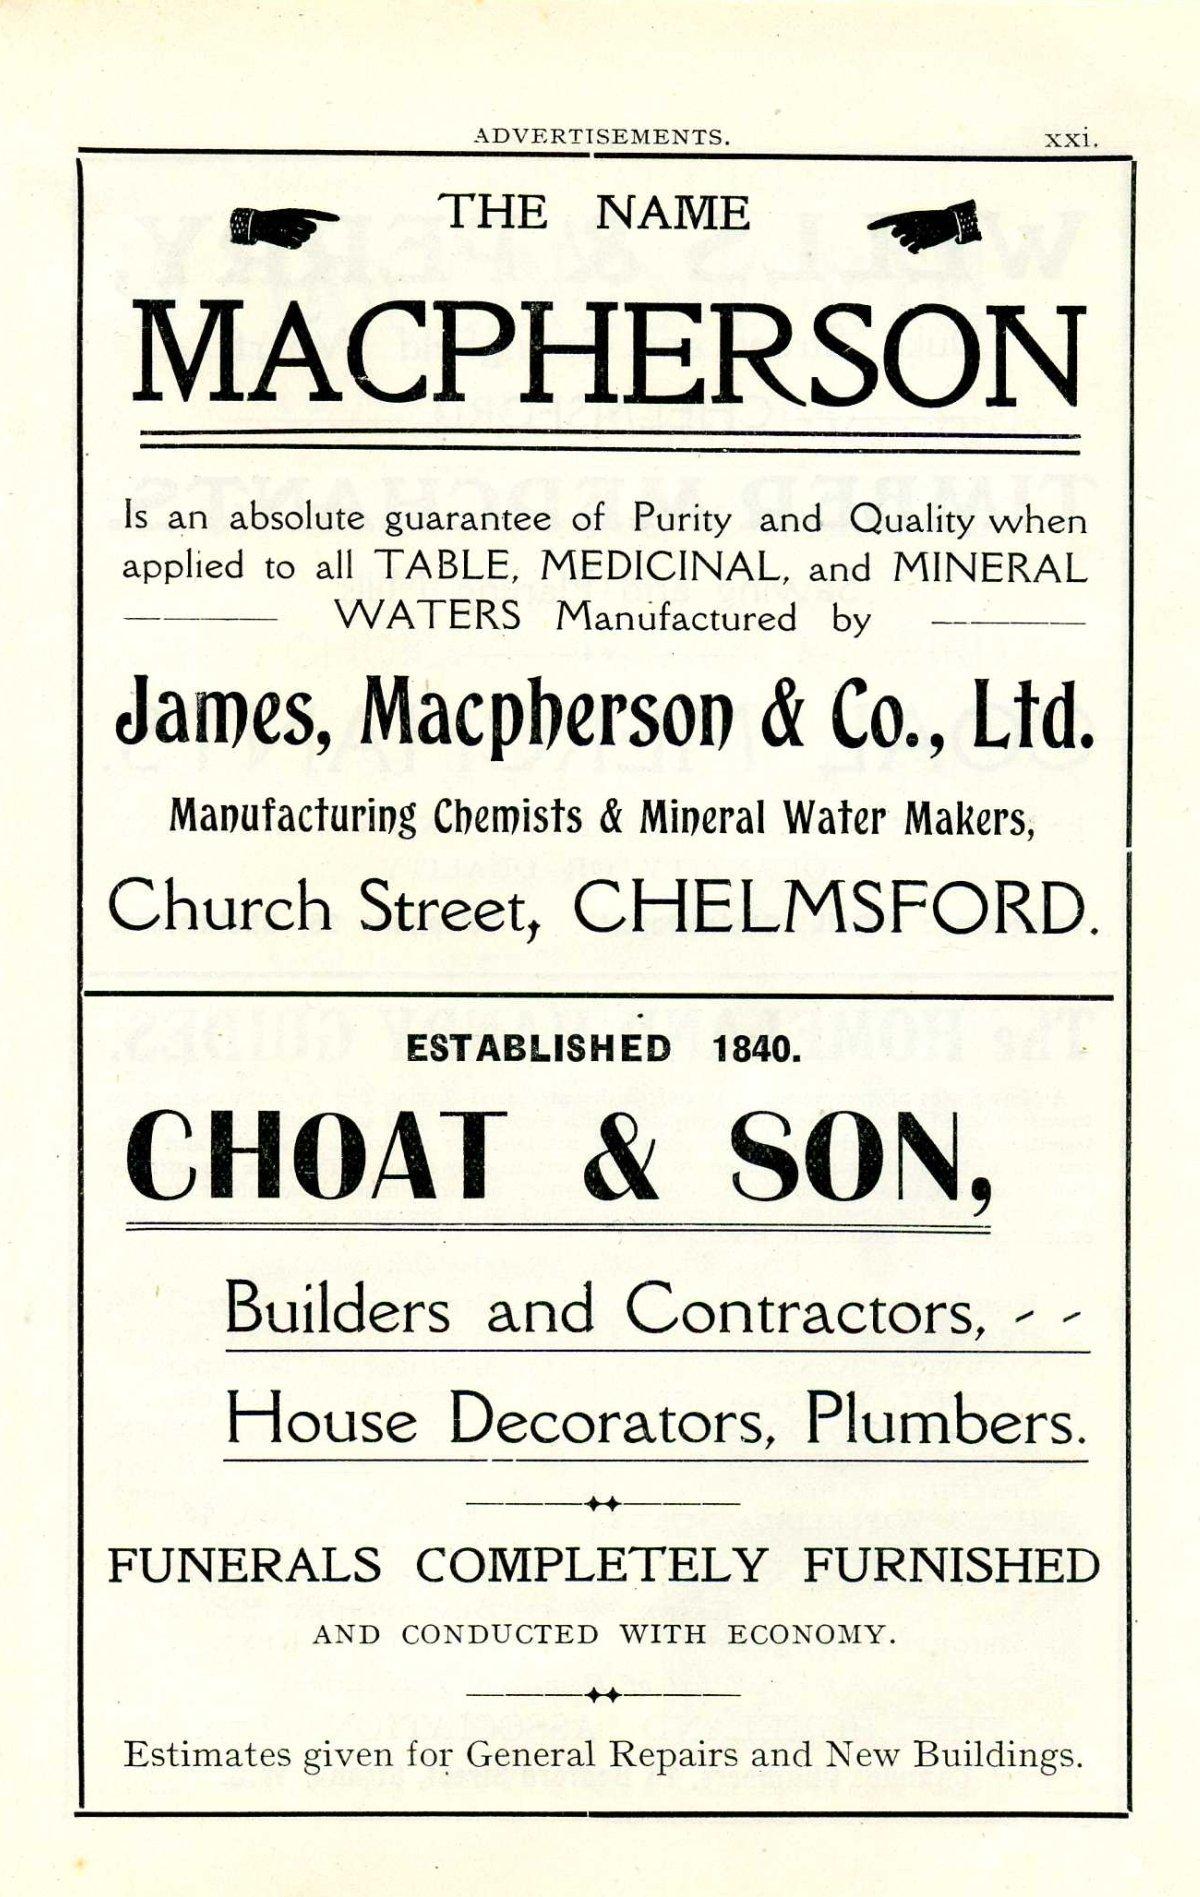 MacPherson advert 1909